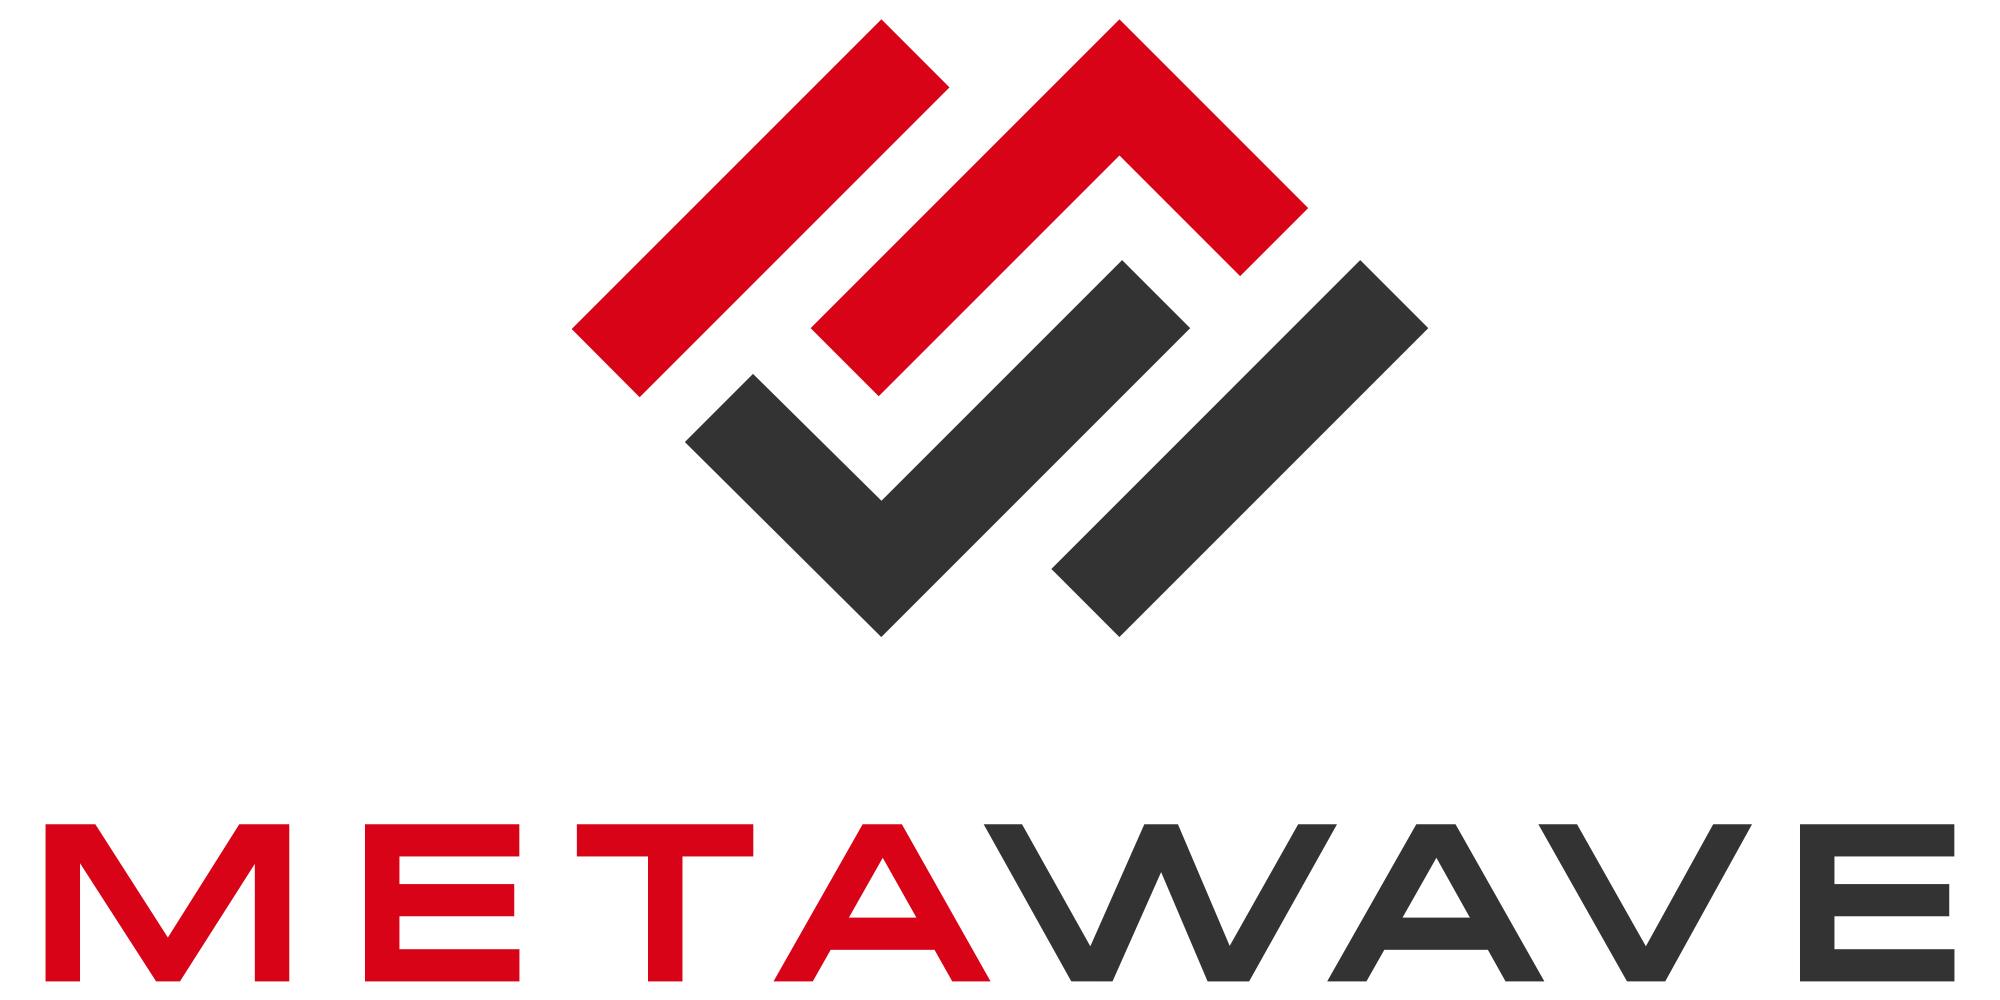 Metawave Corpration